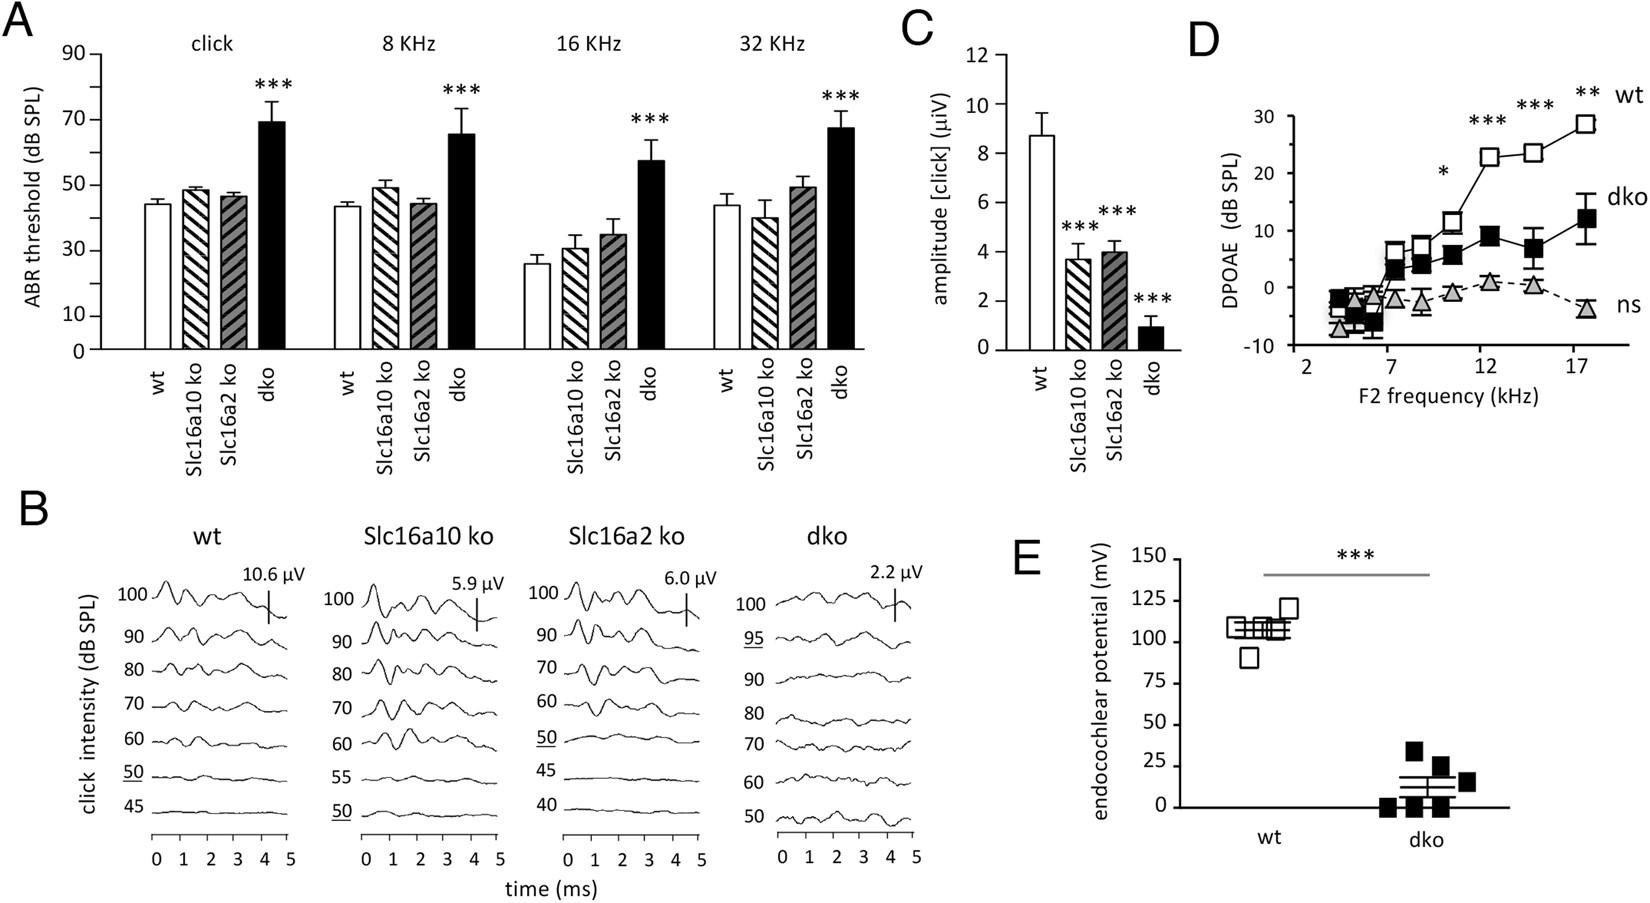 dwarfism effect of hormonal imbalance